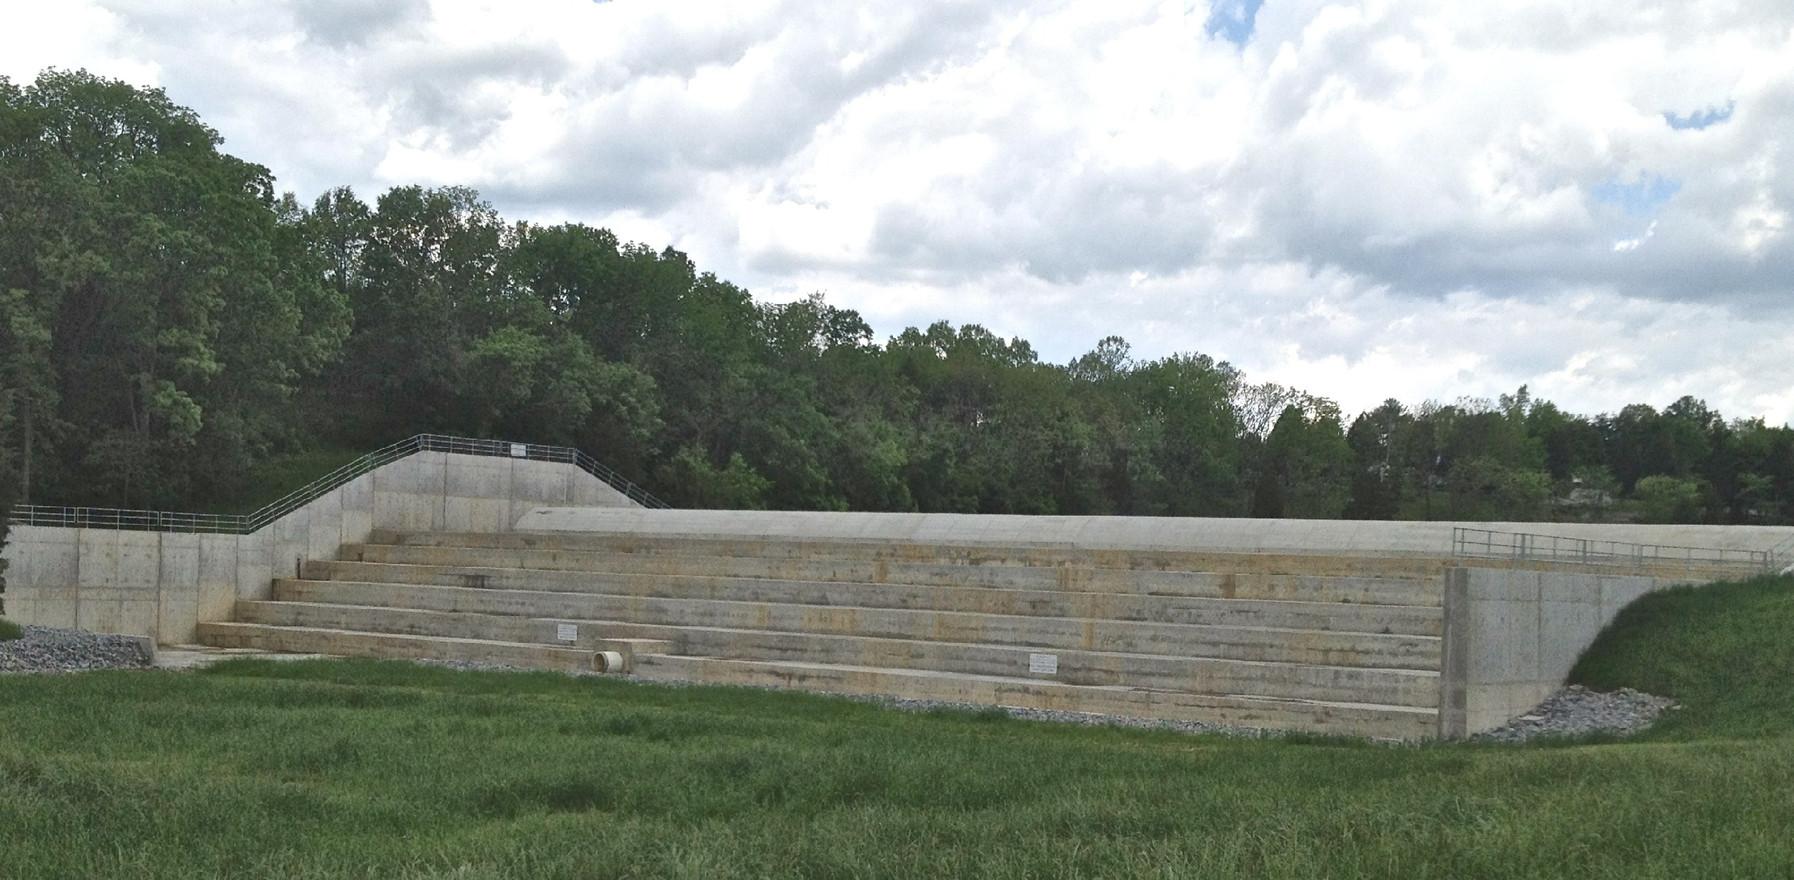 Project Name: Fox Creek